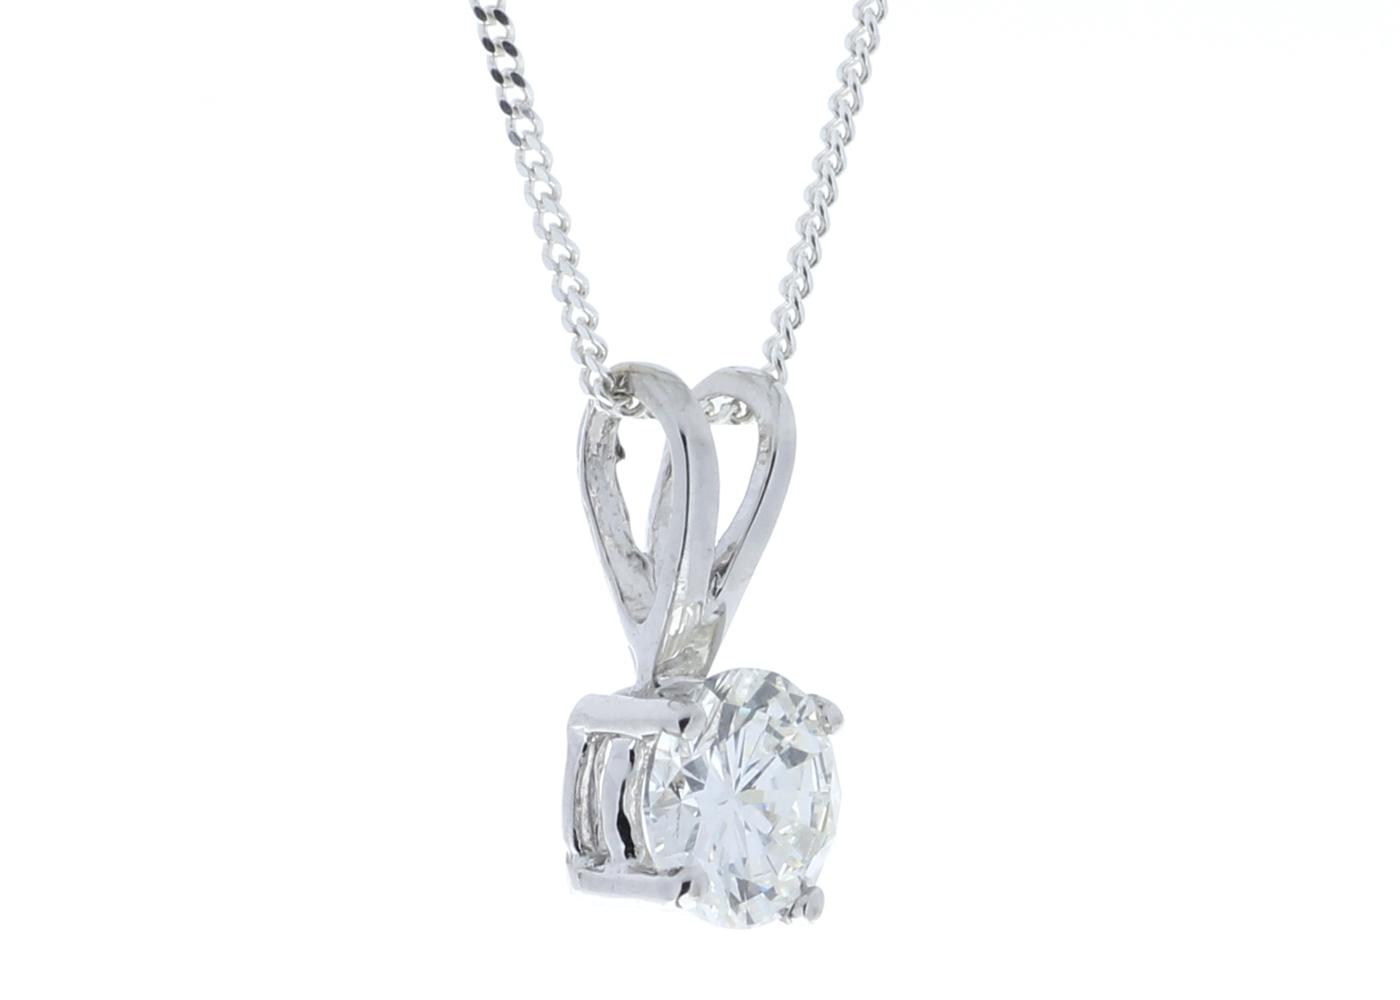 18ct Single Stone Claw Set Diamond Pendant 0.50 Carats - Image 2 of 4